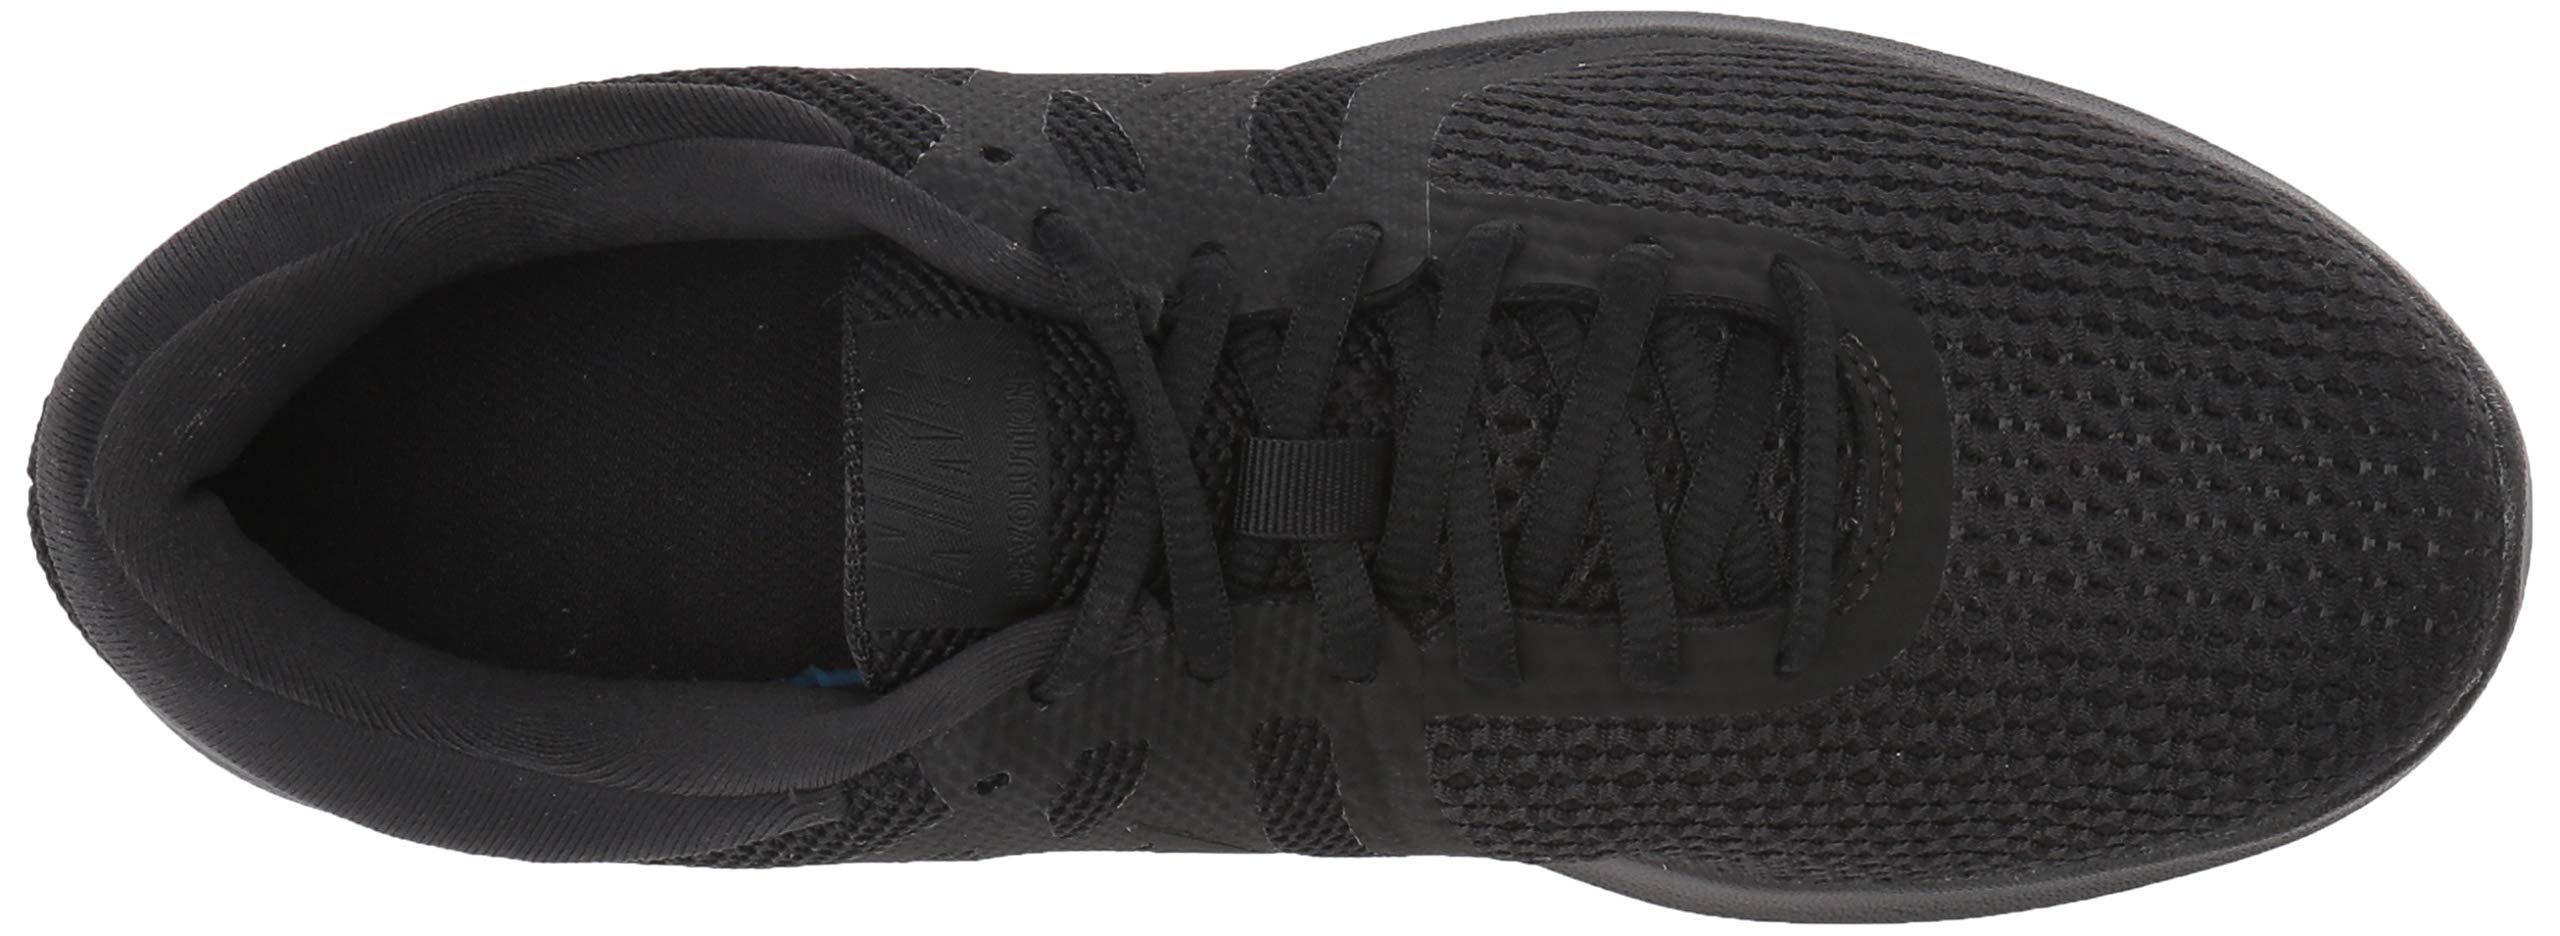 Nike Men's Revolution 4 Running Shoe, Black/White-Anthracite, 7 Regular US by Nike (Image #8)